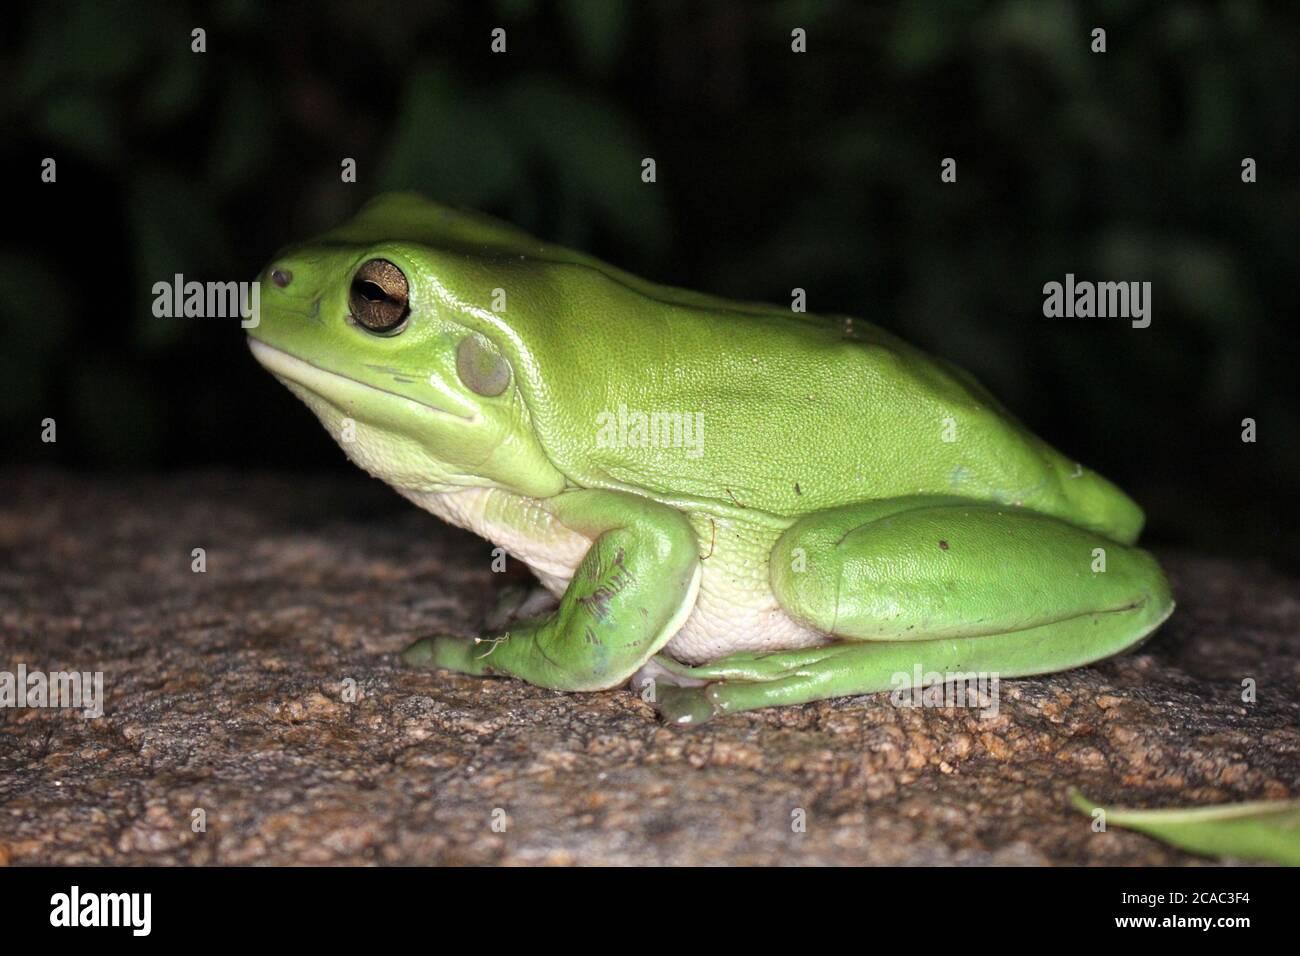 Australian Green Tree Frog at Night Stock Photo